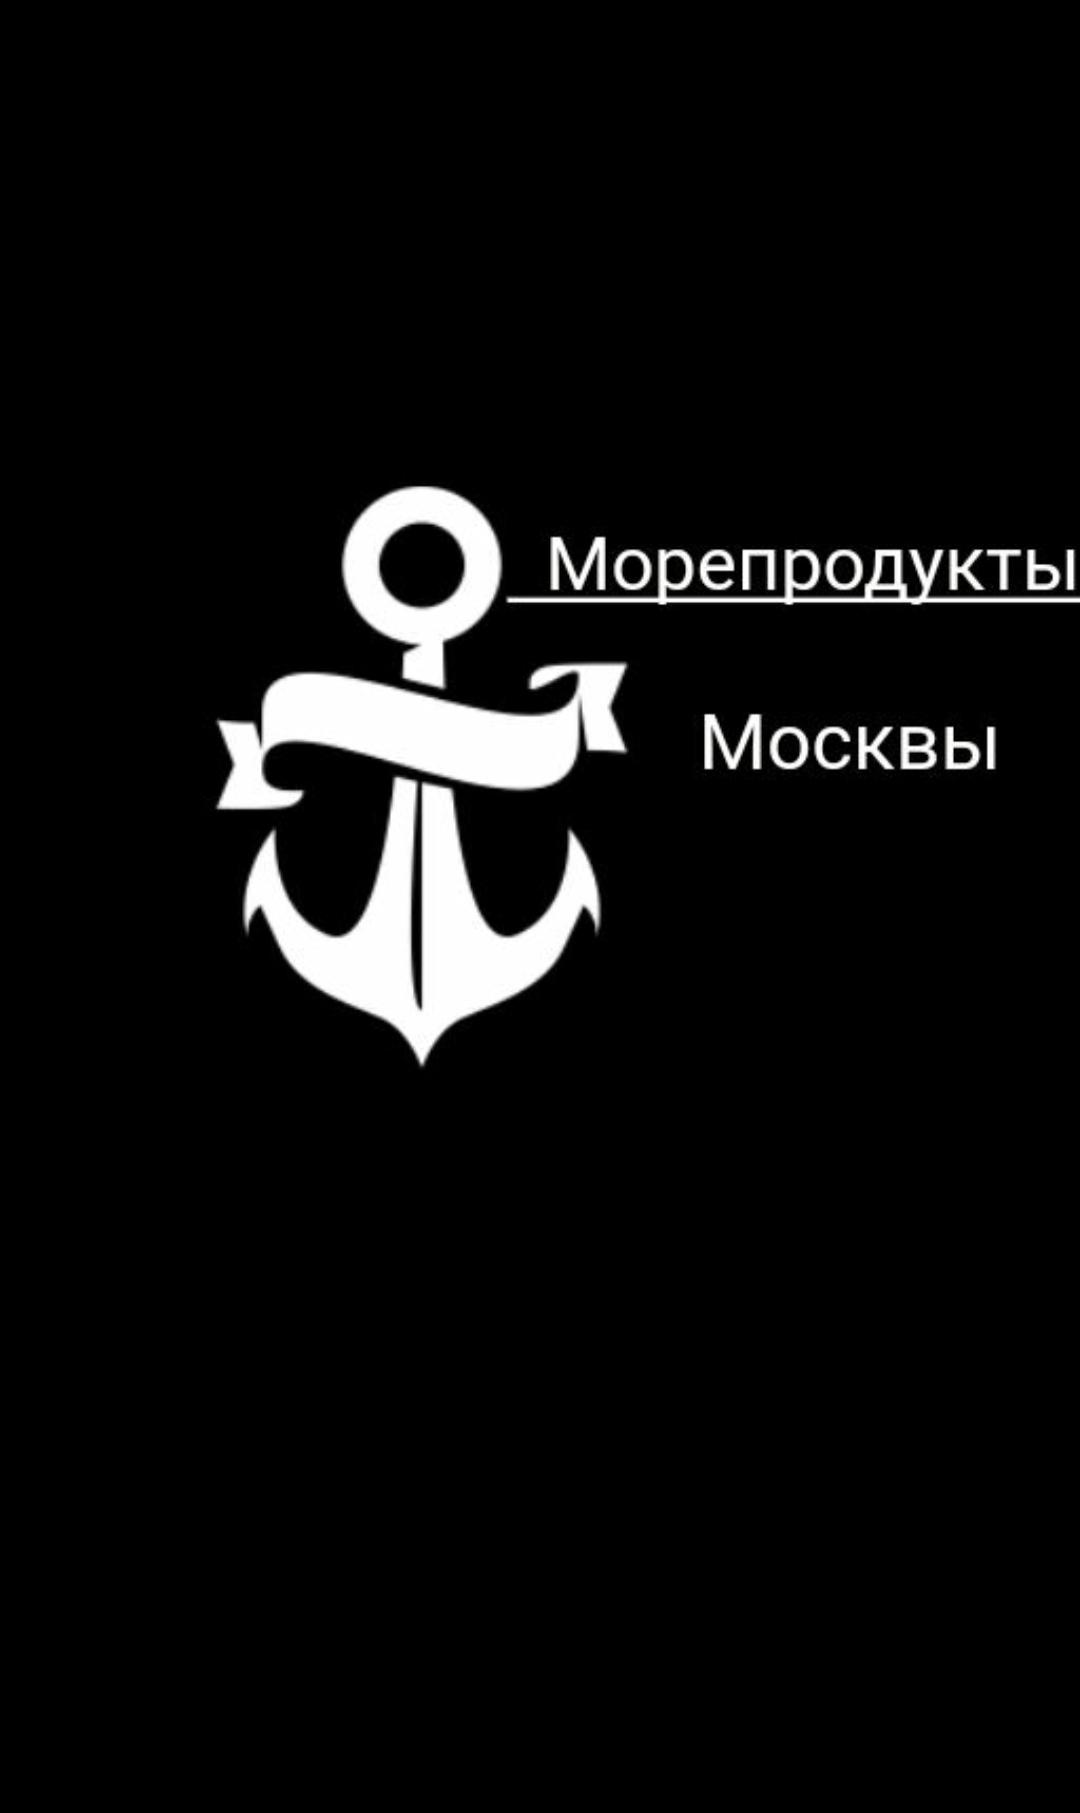 Разработать логотип.  фото f_2805ec677b4b8f5b.jpg